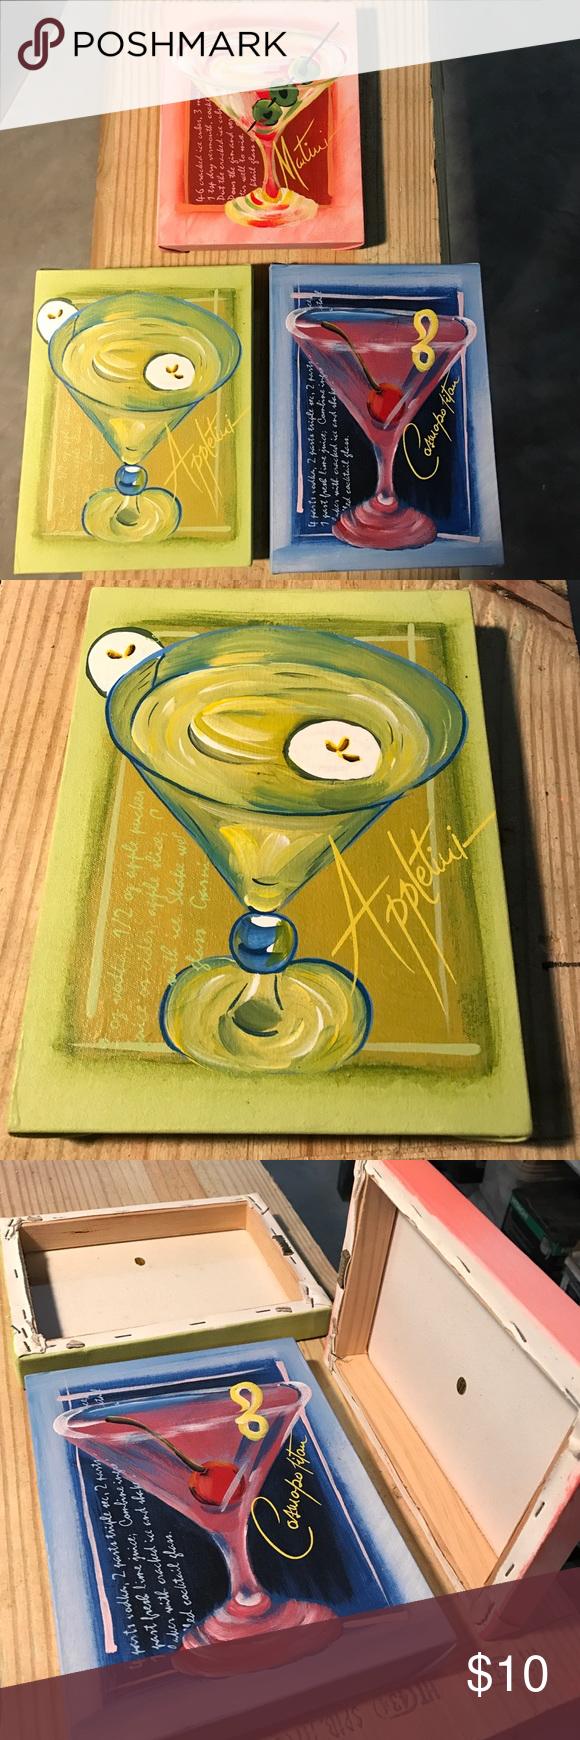 Luxury Martini Glass Wall Art Frieze - Art & Wall Decor - hecatalog.info